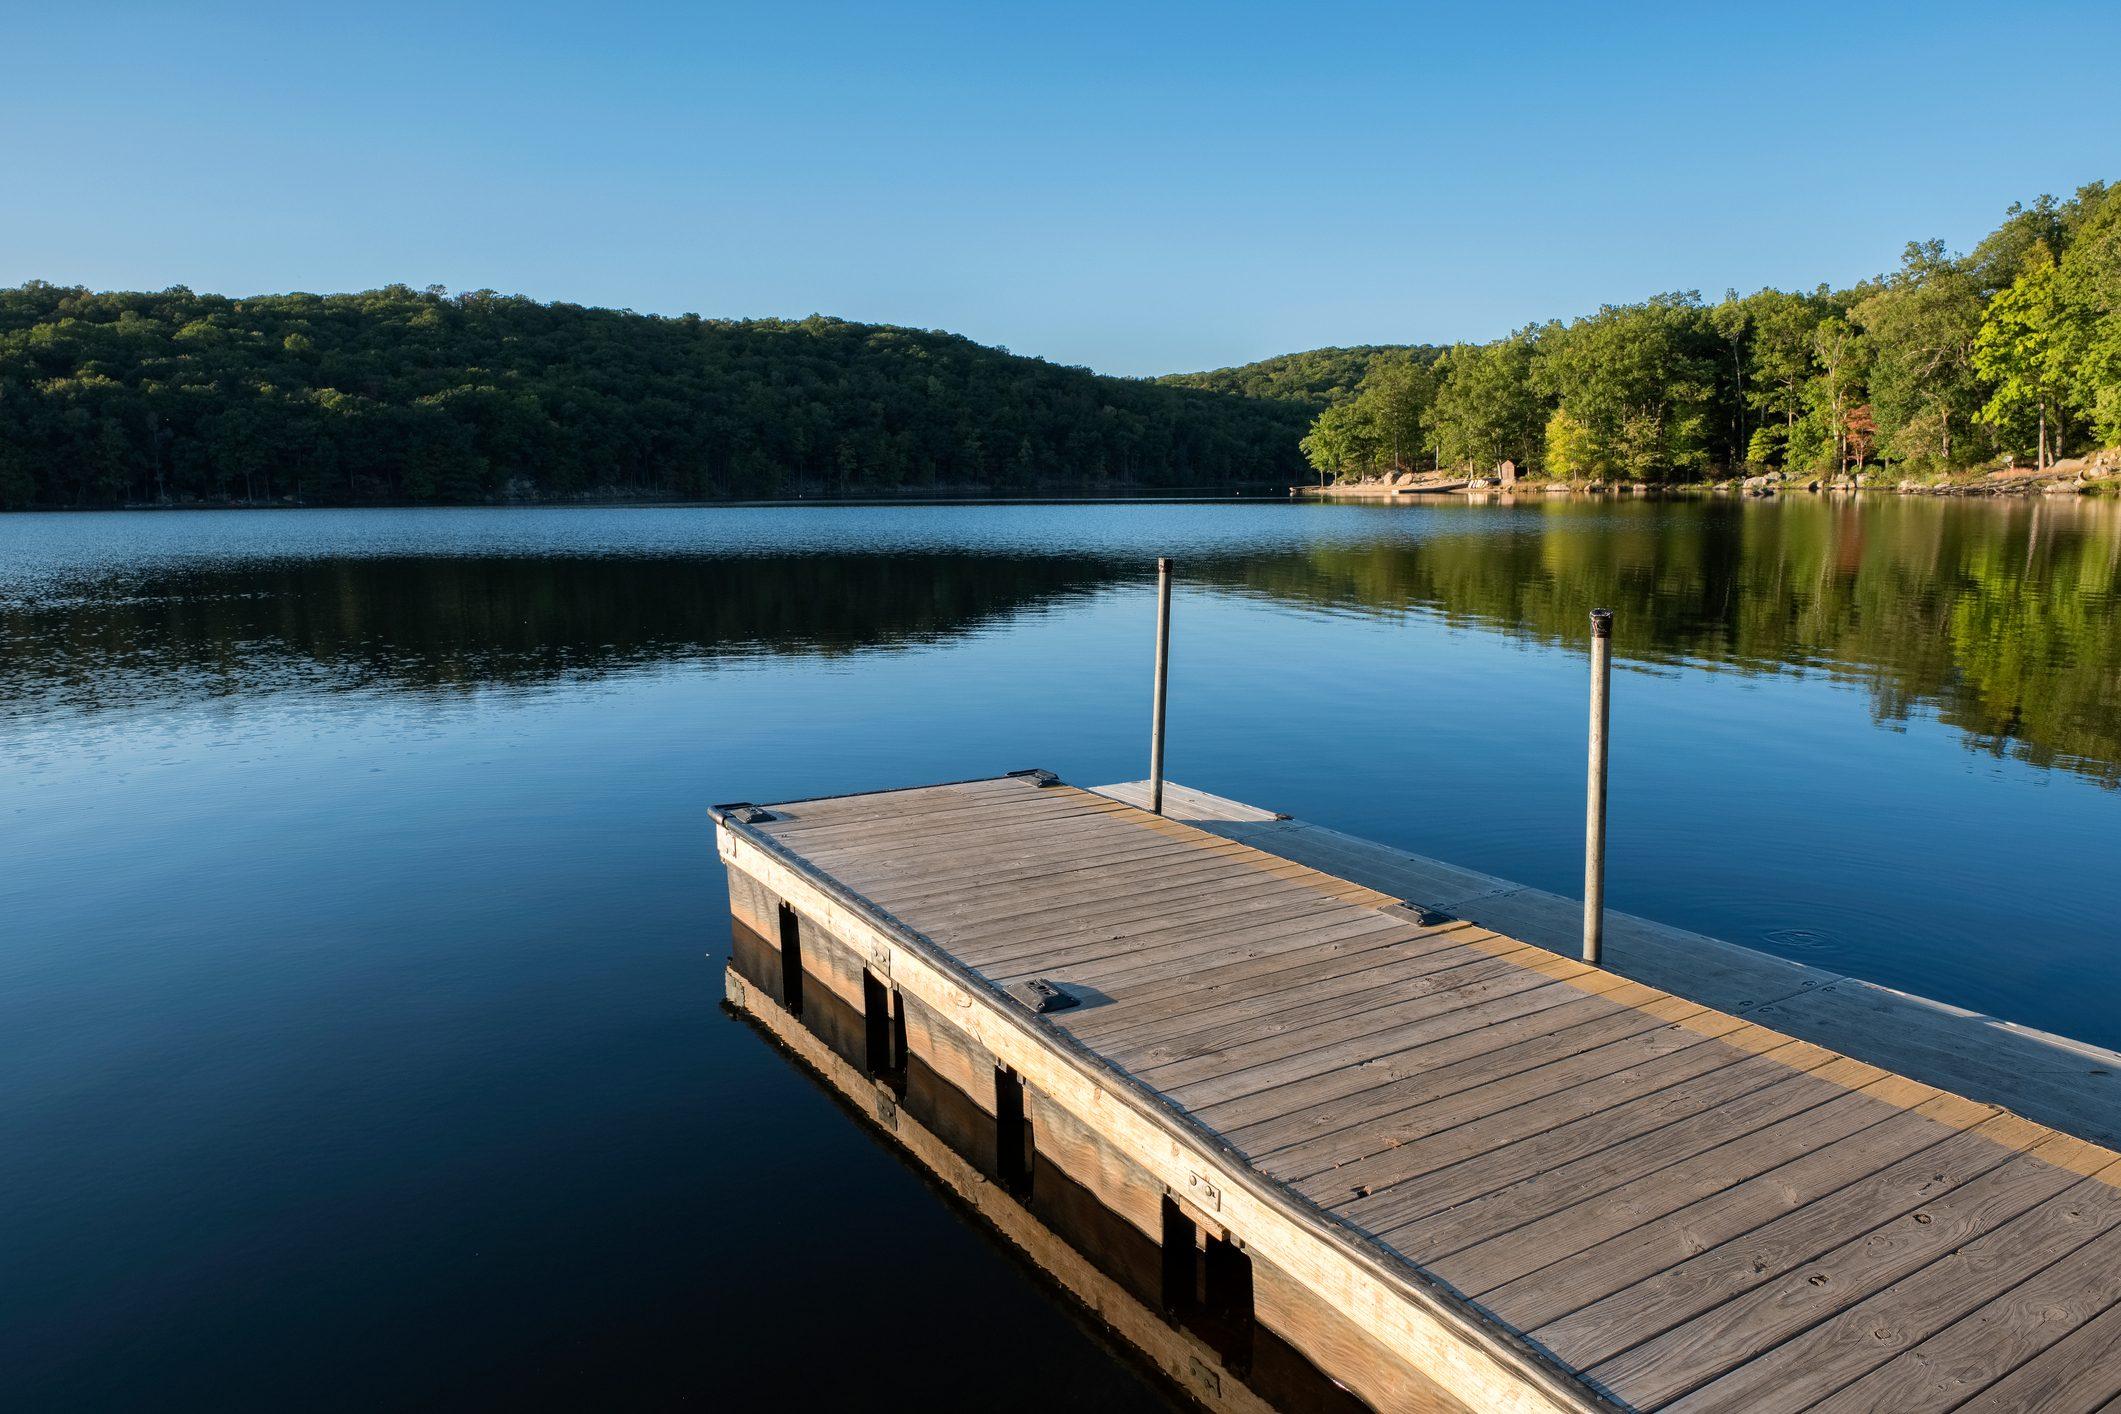 Dock at Lake Sebago, Harriman State Park, New York, USA.